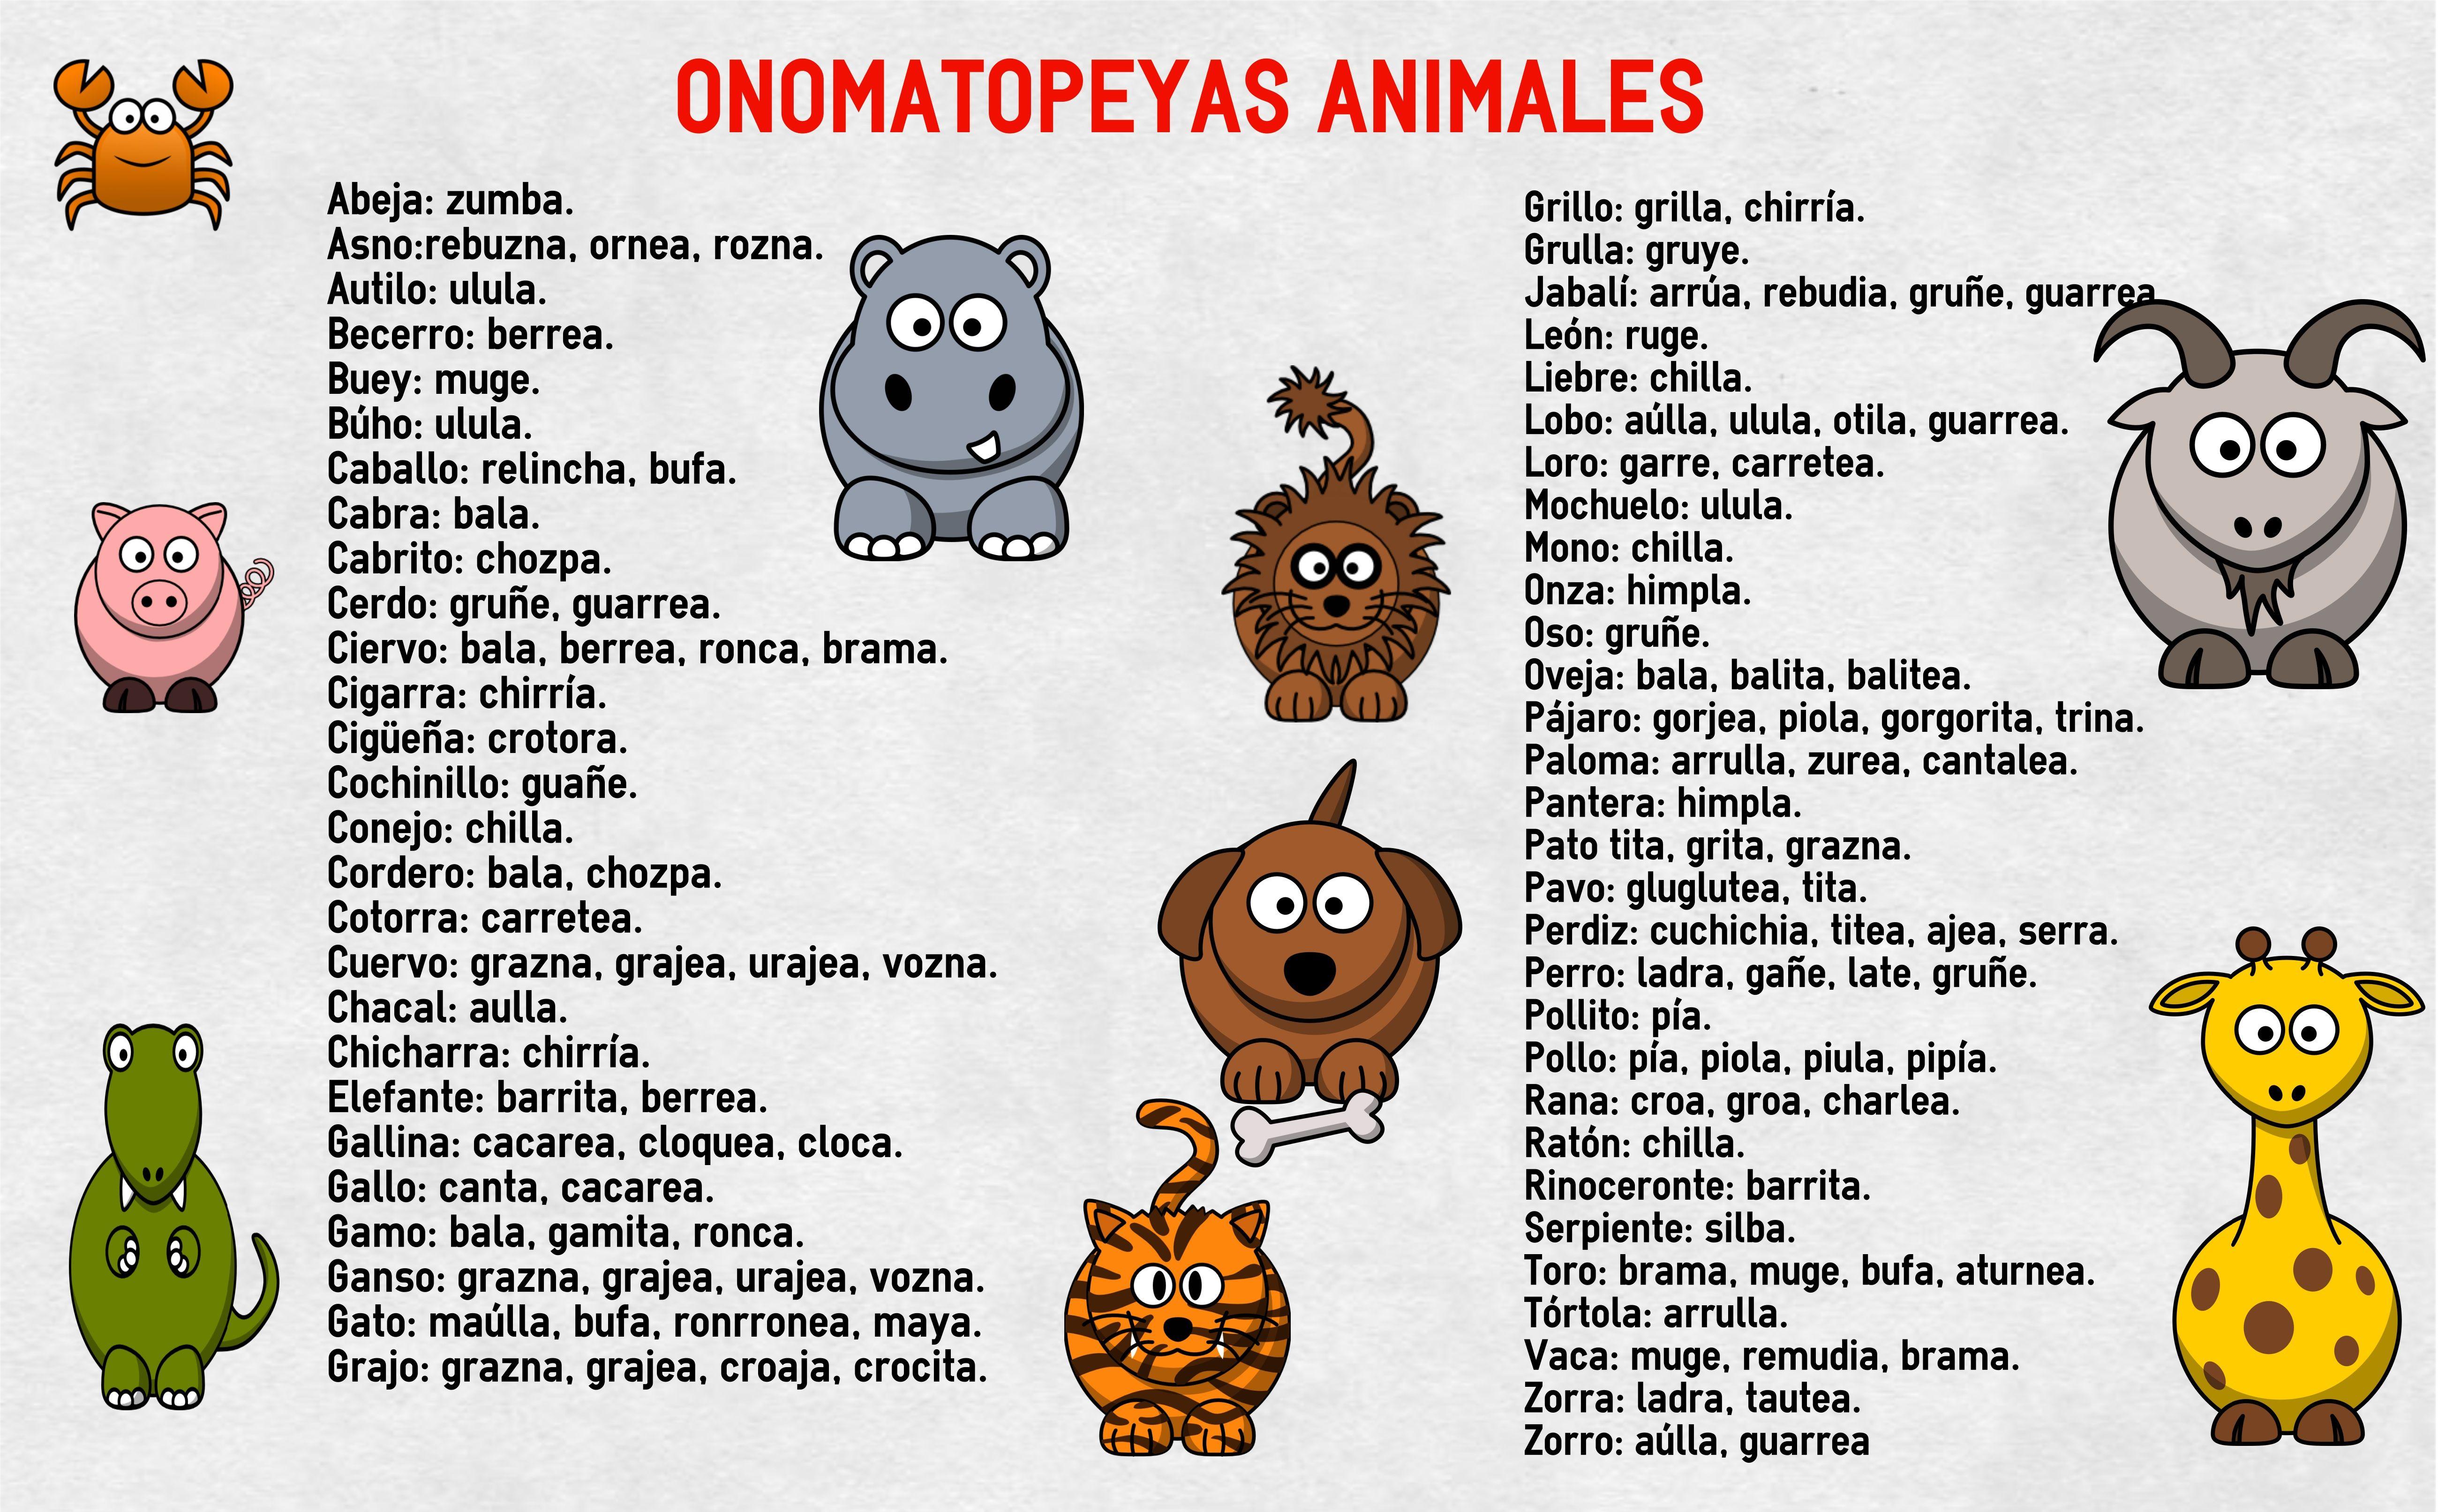 Onomatopeyas Animales Su Nombre Onomatopeyas Animales Onomatopeyas Animales